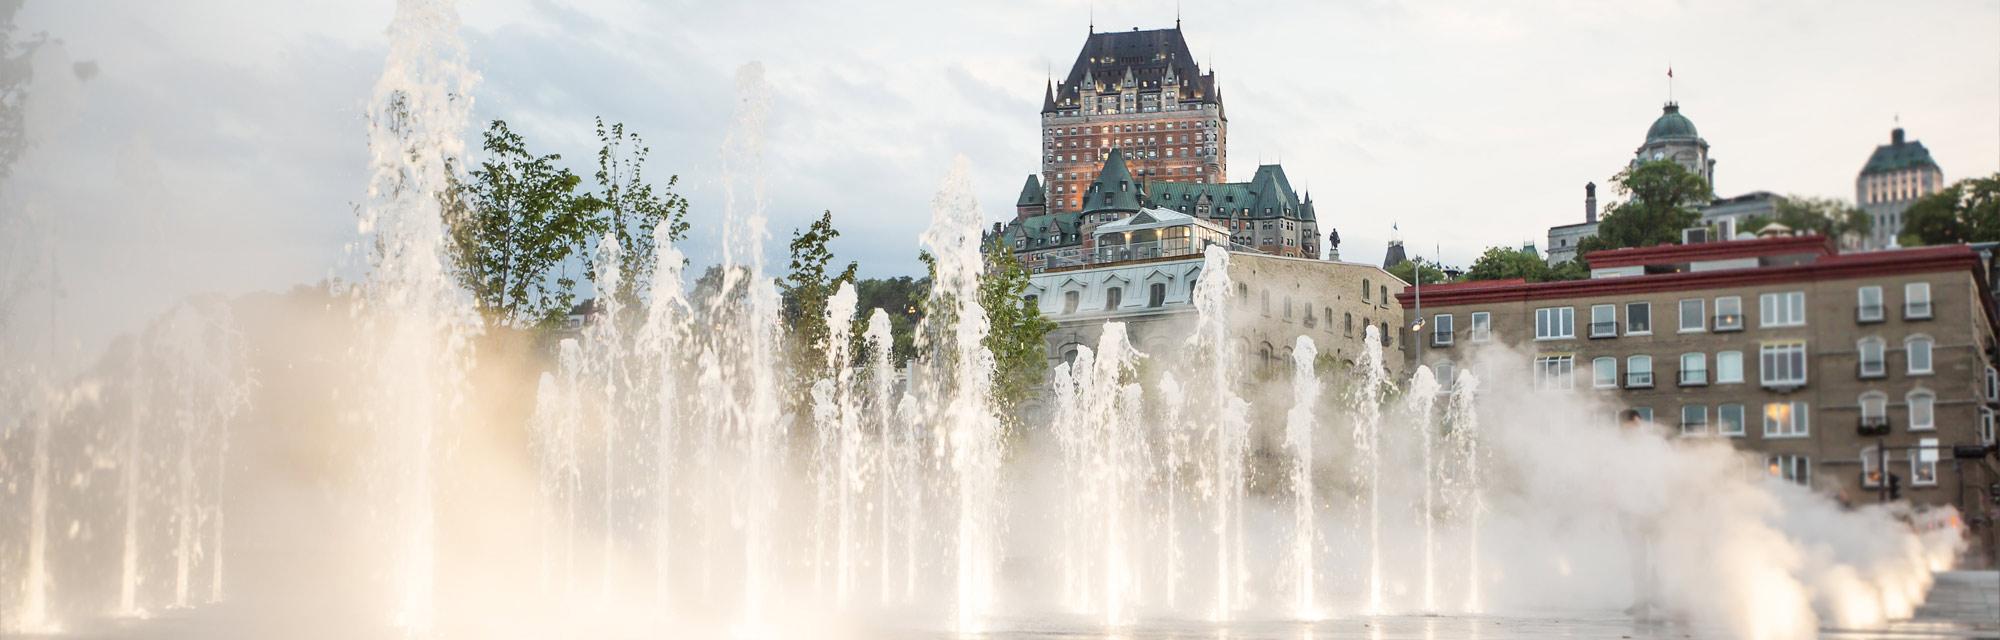 Sprachschulen Quebec, Sprachkurse Quebec